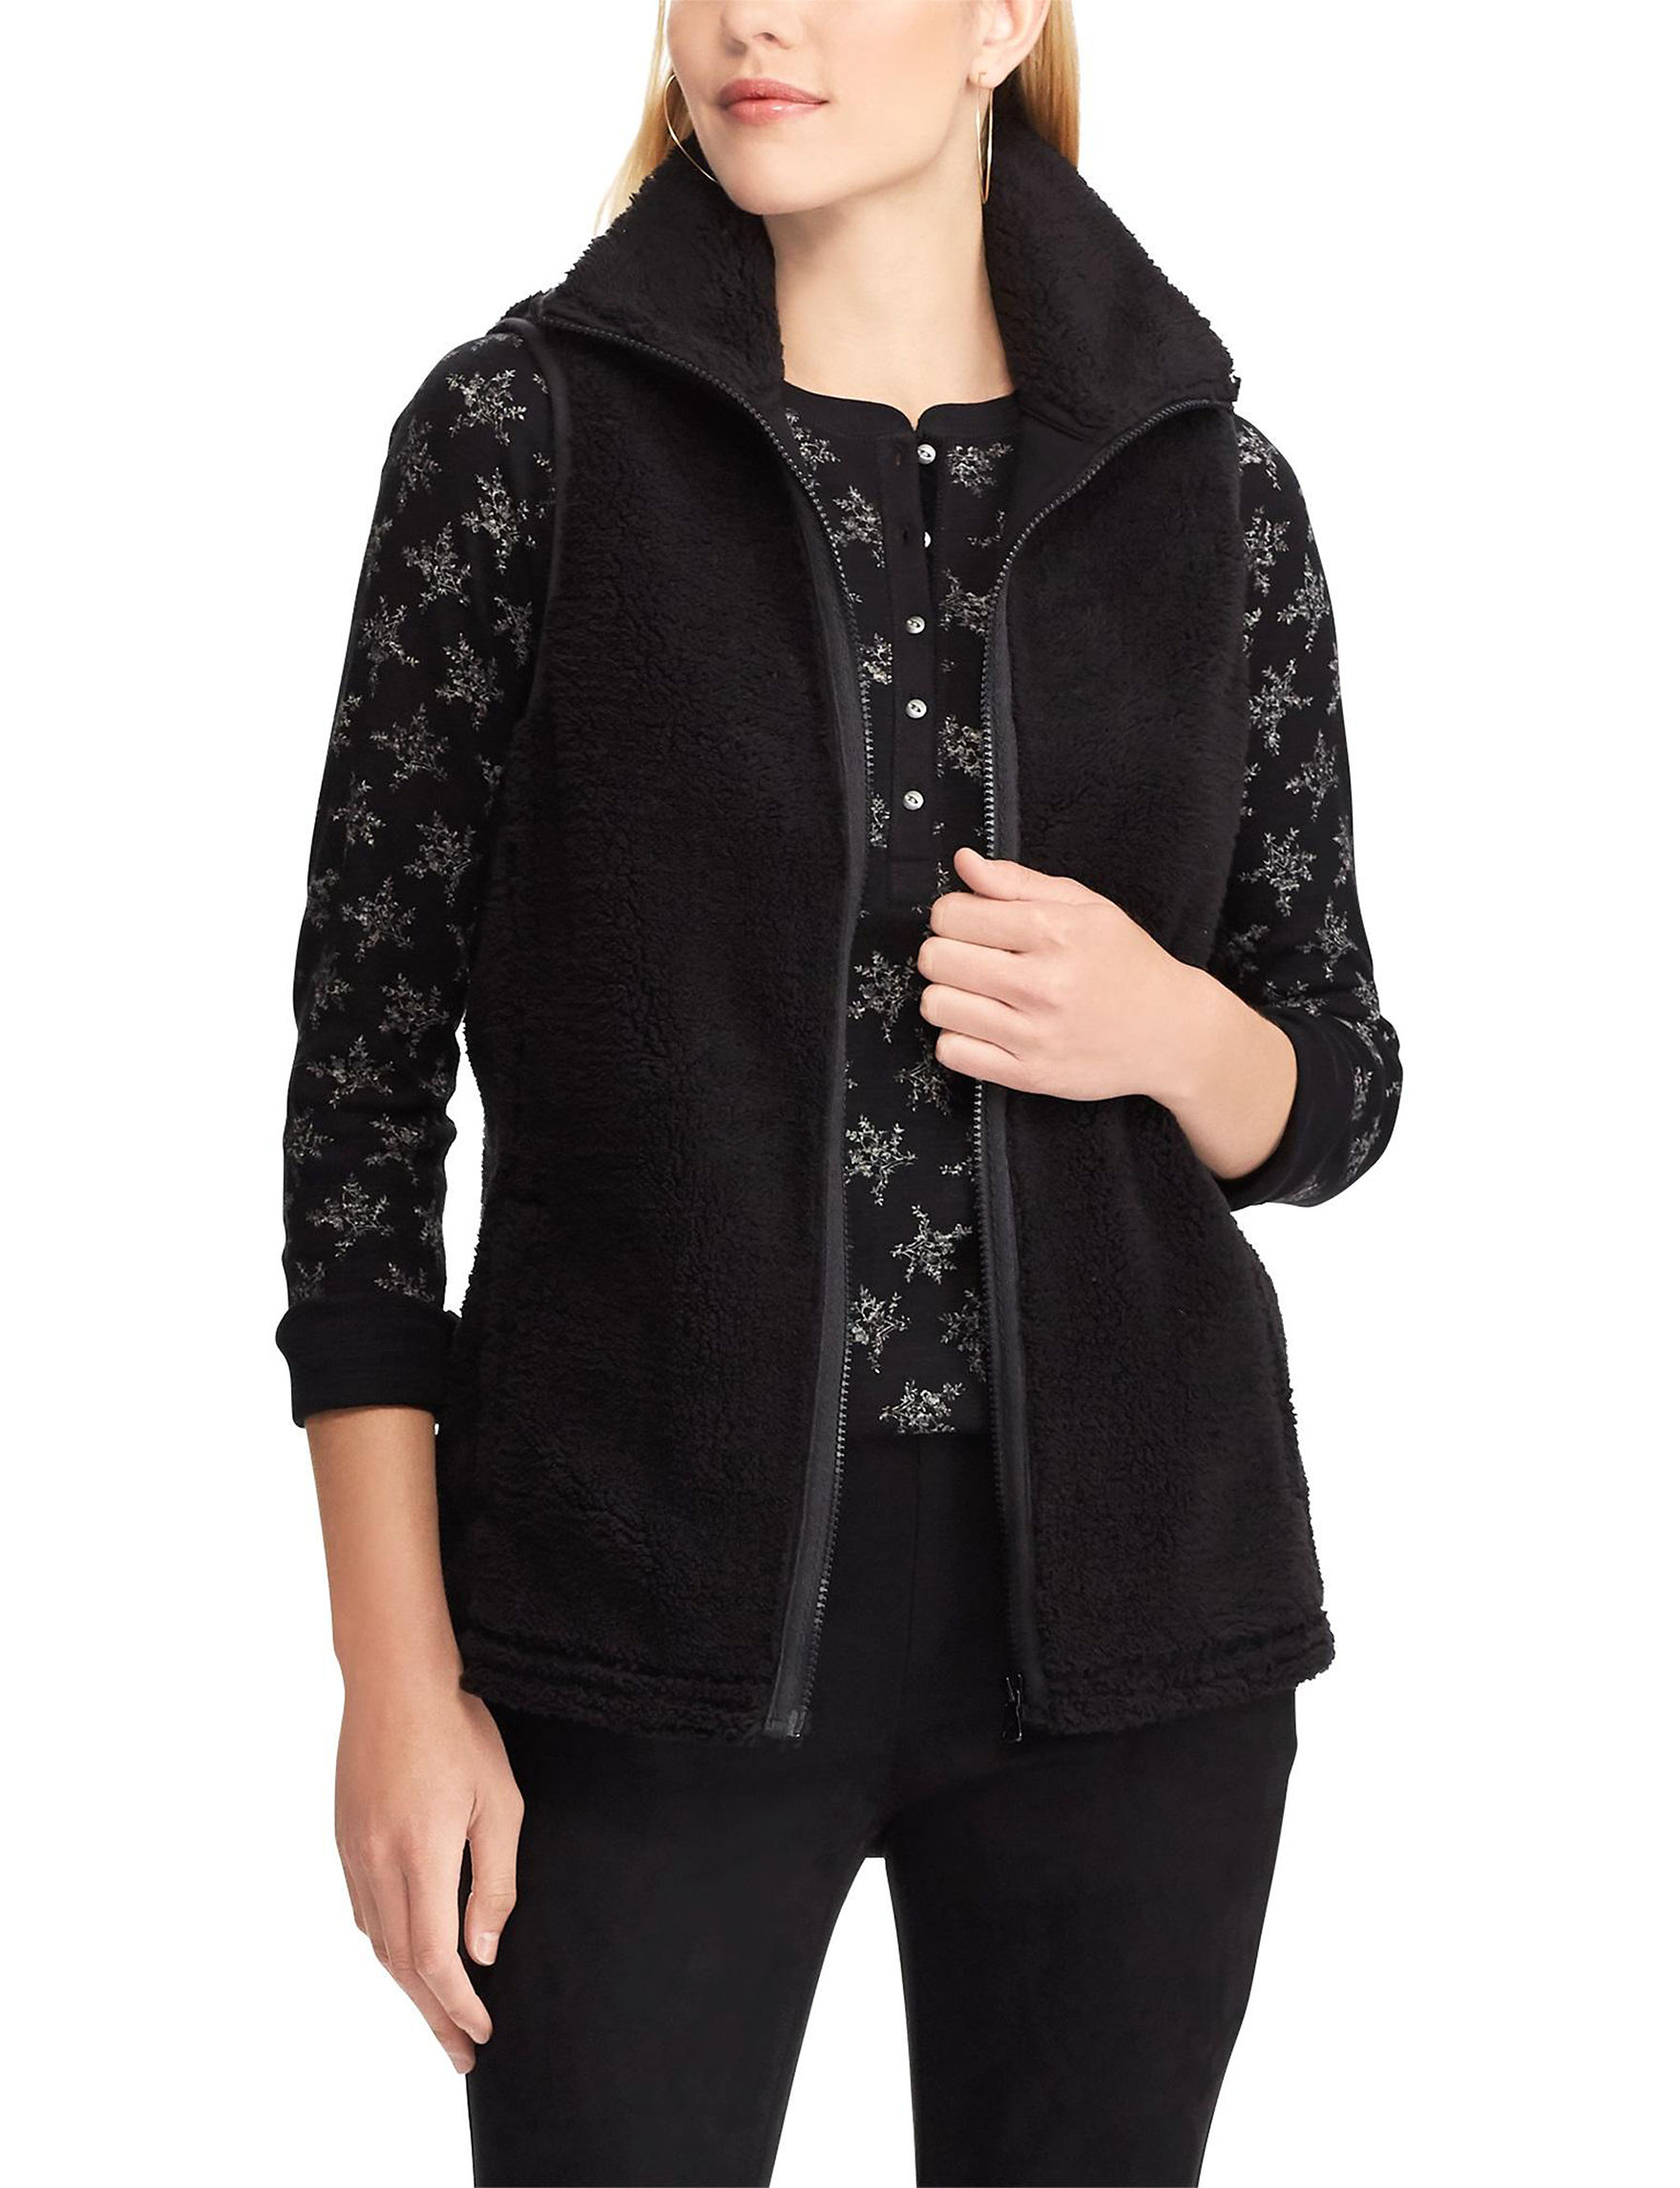 Chaps Black Sweater Vests Vests